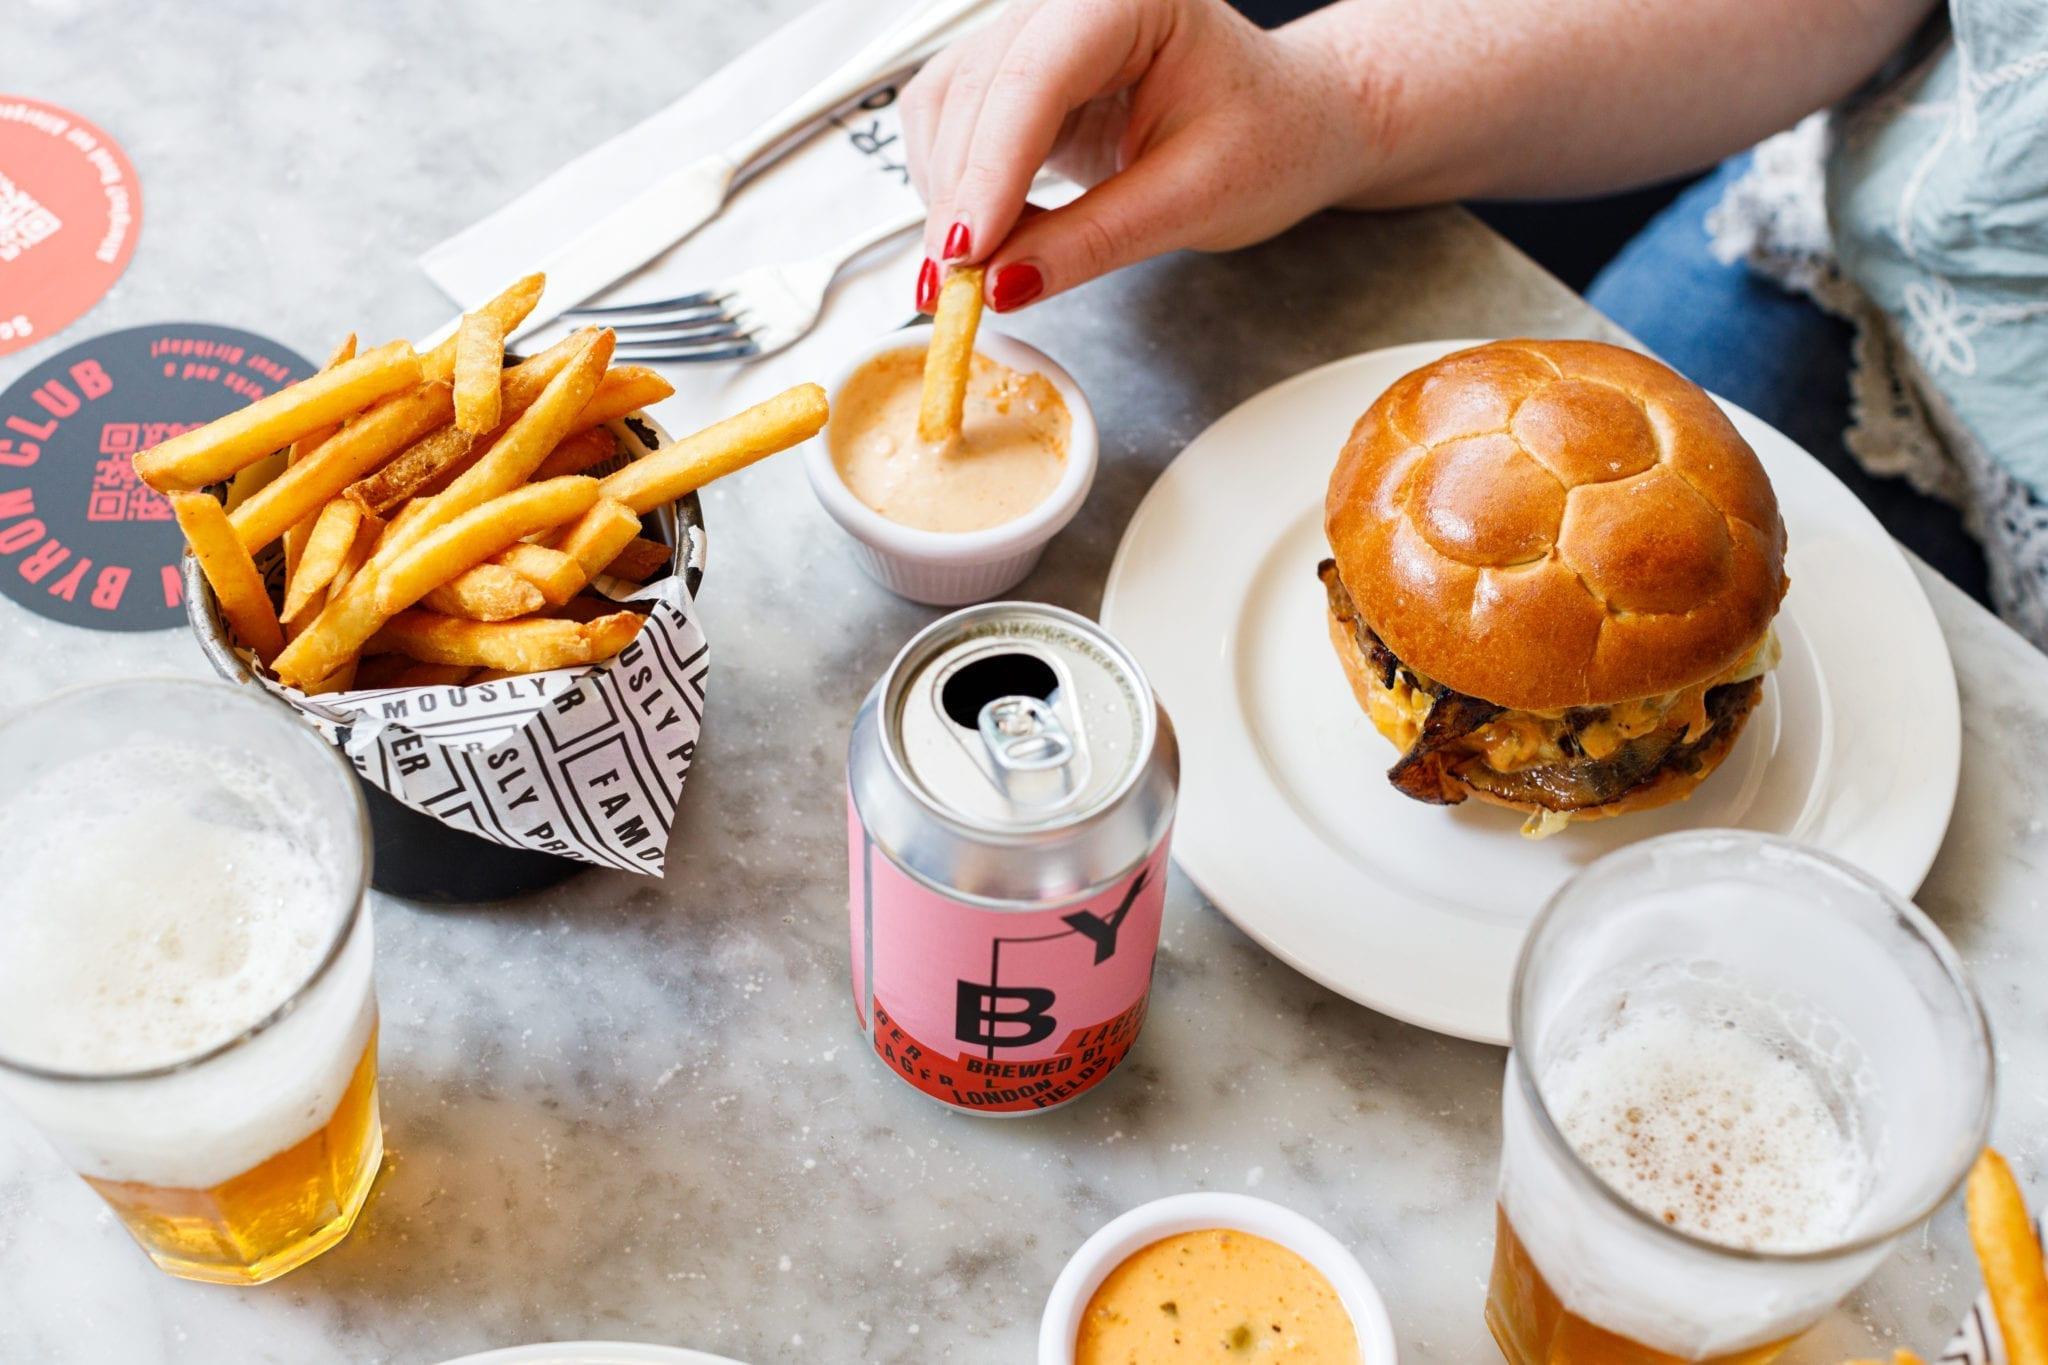 Dribble Burger by Byron Burgers